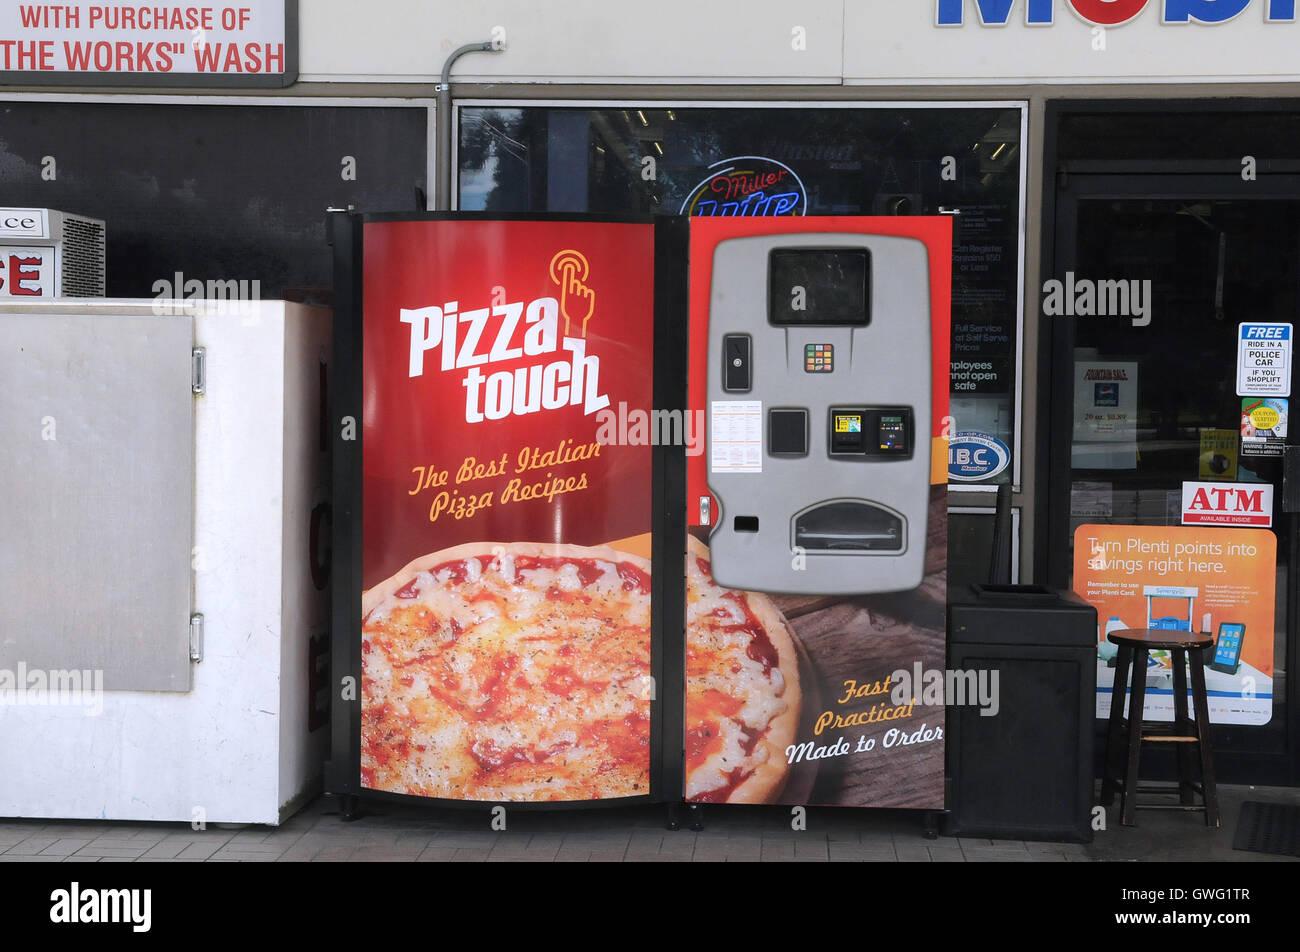 food vending machine stock photos food vending machine. Black Bedroom Furniture Sets. Home Design Ideas